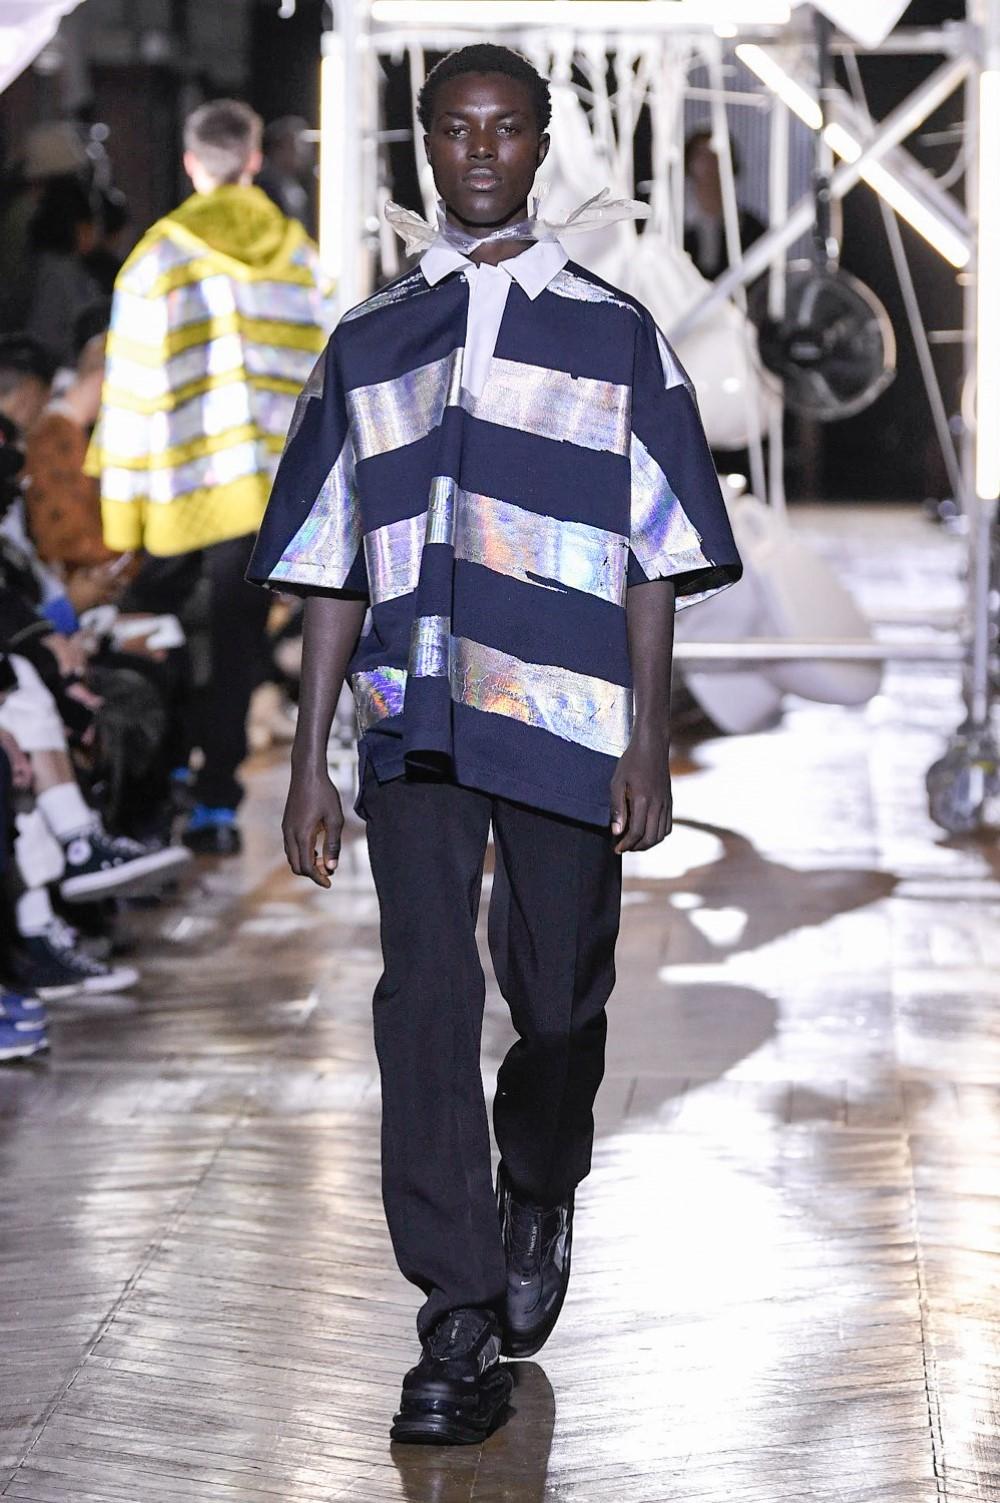 Botter - Automne-Hiver 2020-2021 - Paris Fashion Week